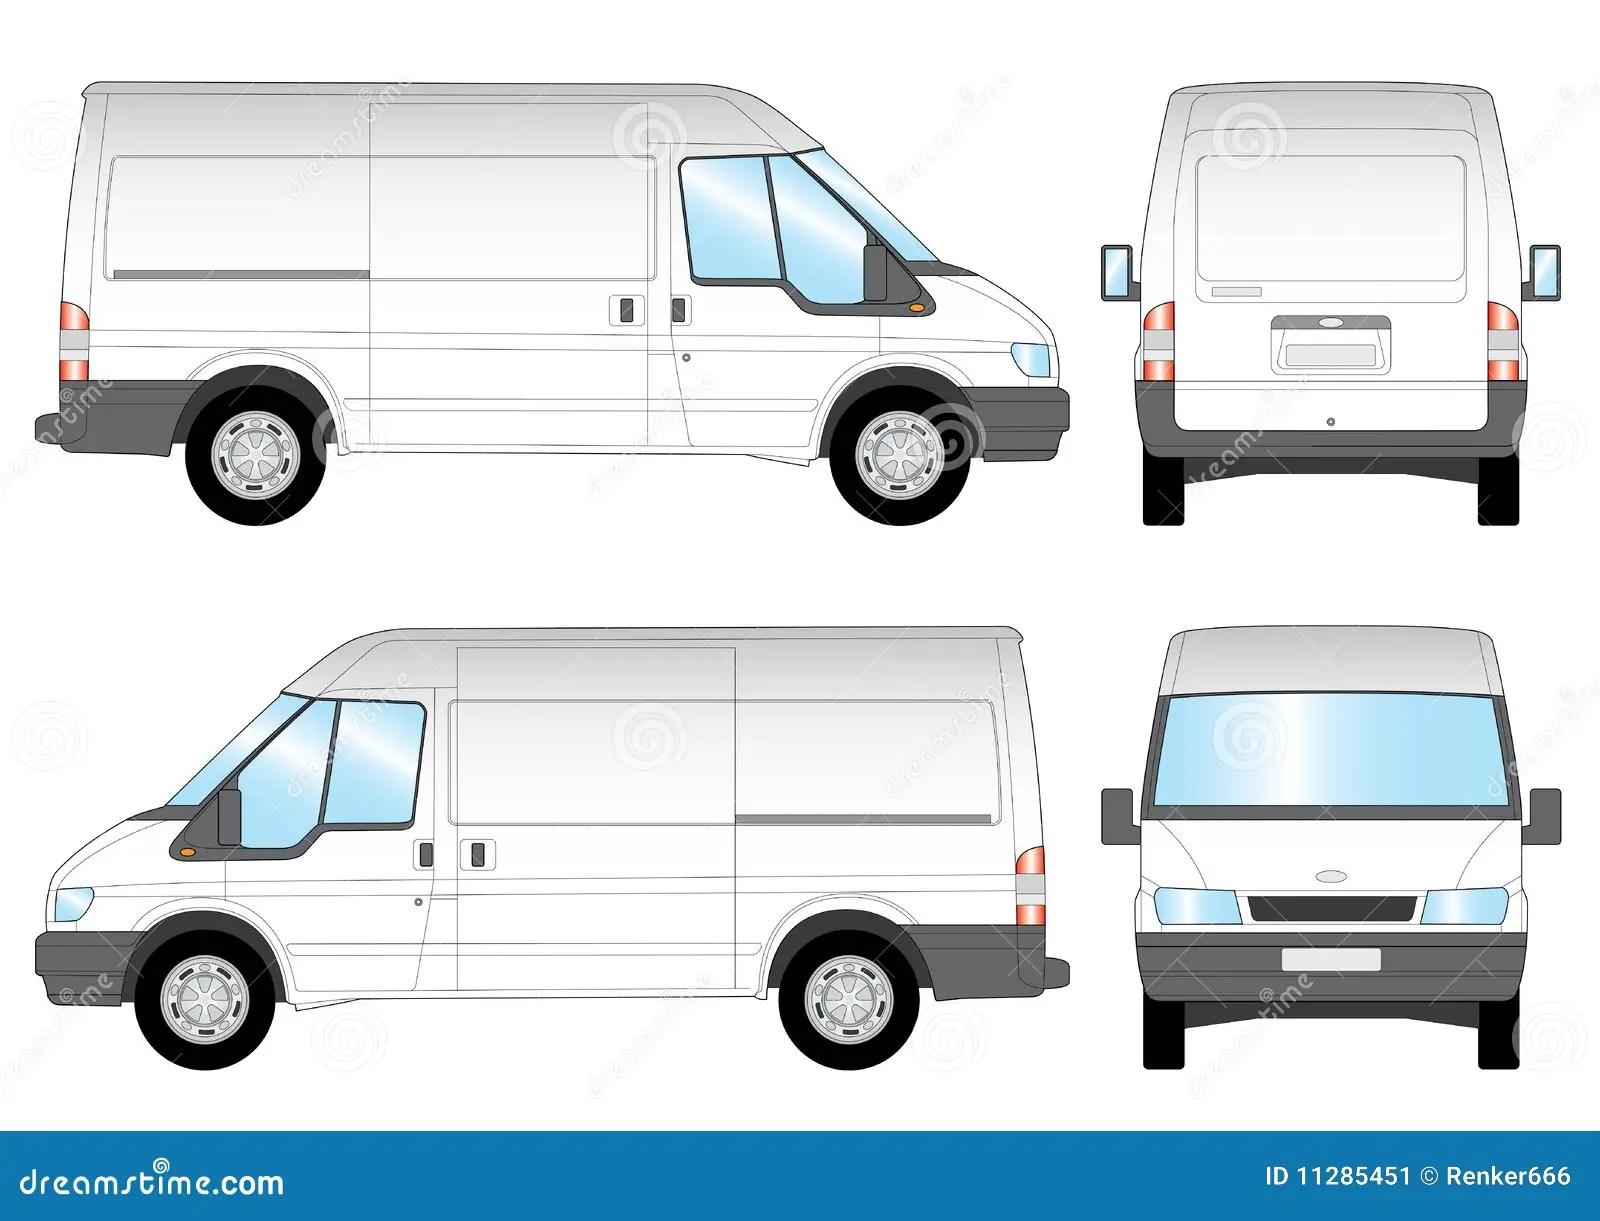 hight resolution of ford transit van diagram wiring diagram expert ford transit van diagram ford transit van diagram